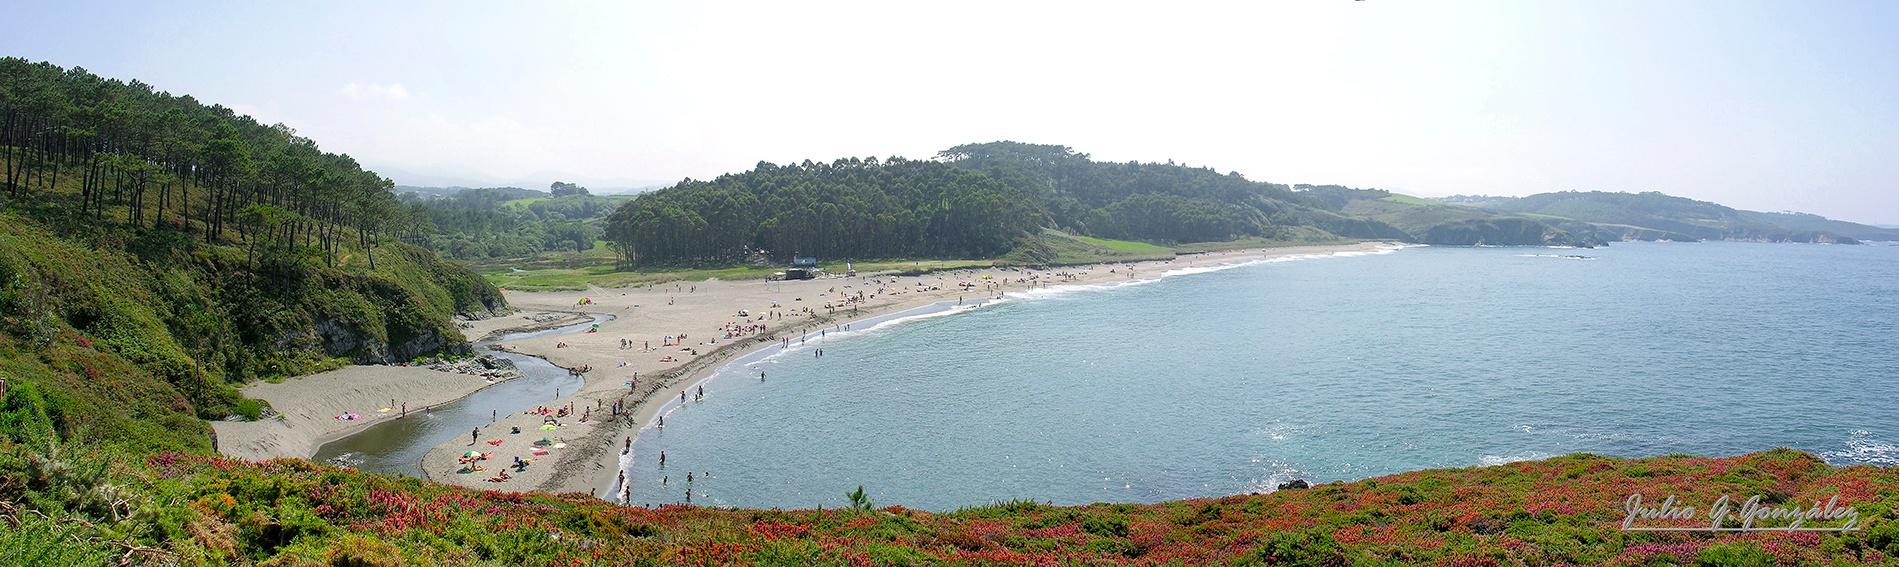 Photo in Sea and Sand #navia #asturias #españa #spain